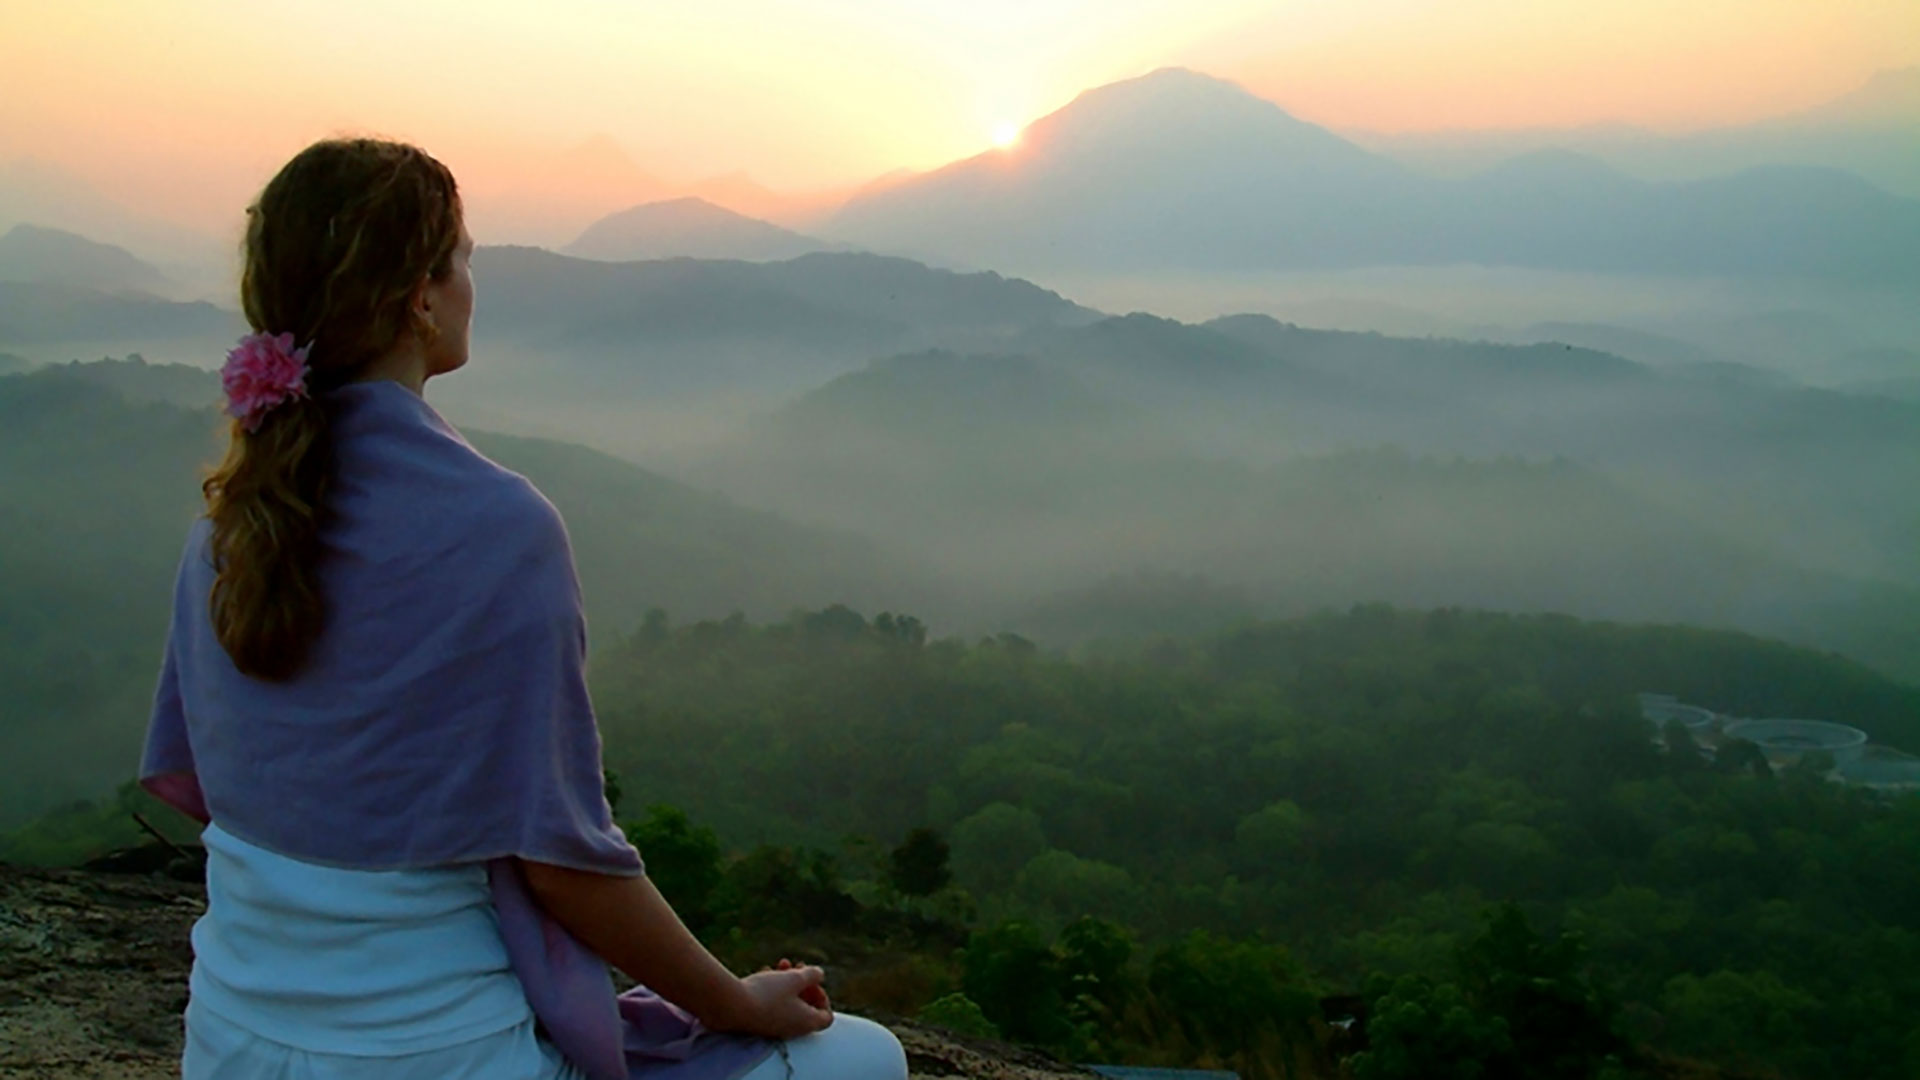 Soham: A Step by Step Approach | Yoga International